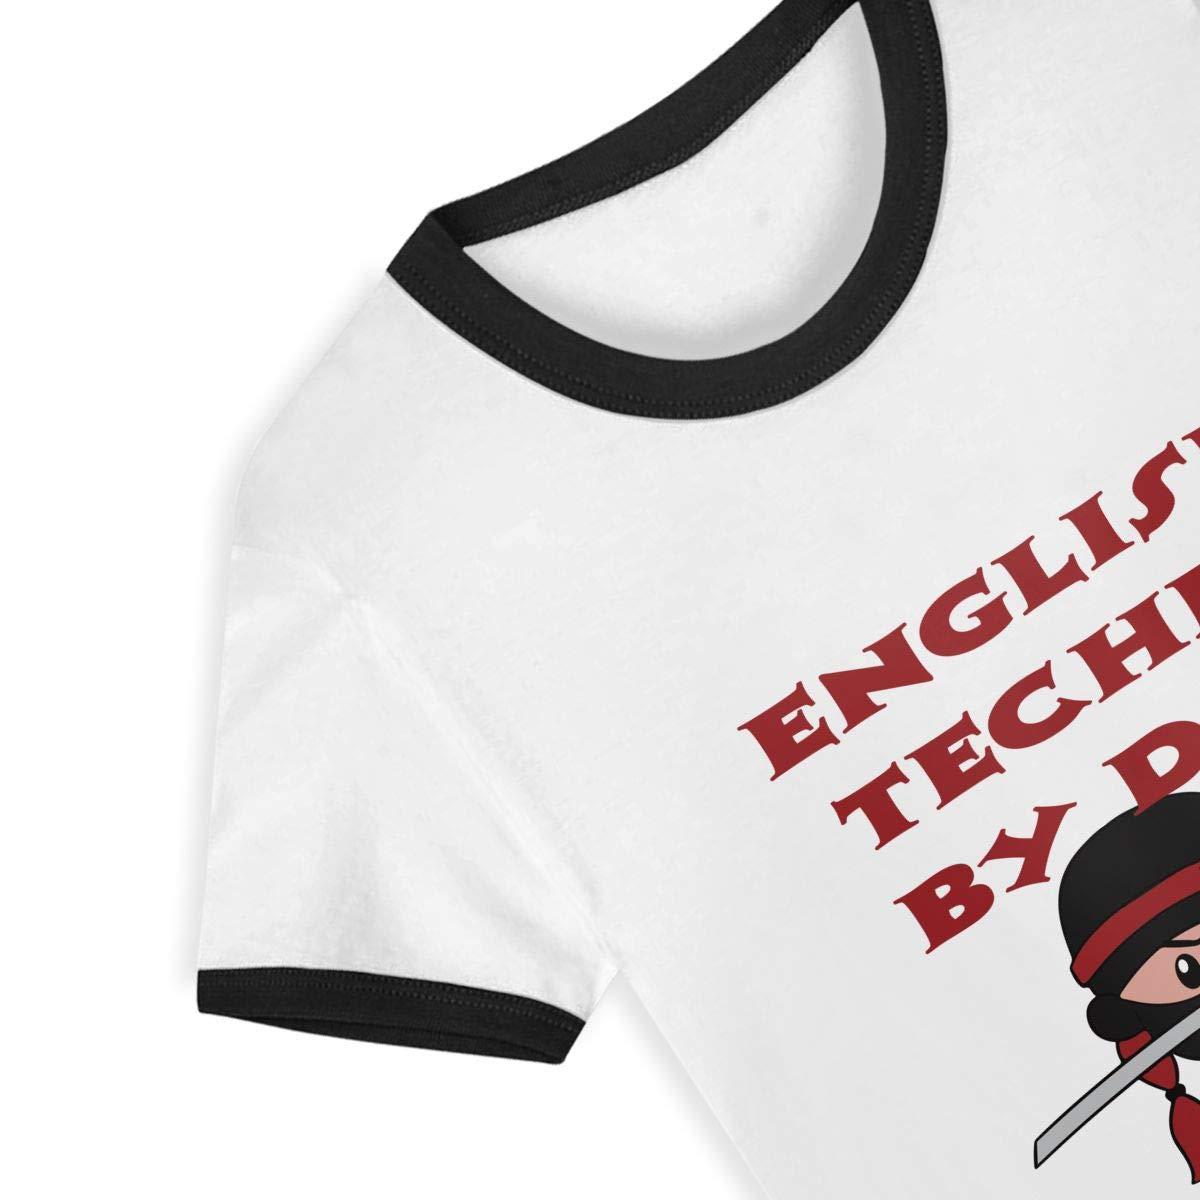 CY SHOP Mapping Tech by Day Ninja by Night Childrens Boys Girls Contrast Short Sleeve T-Shirt